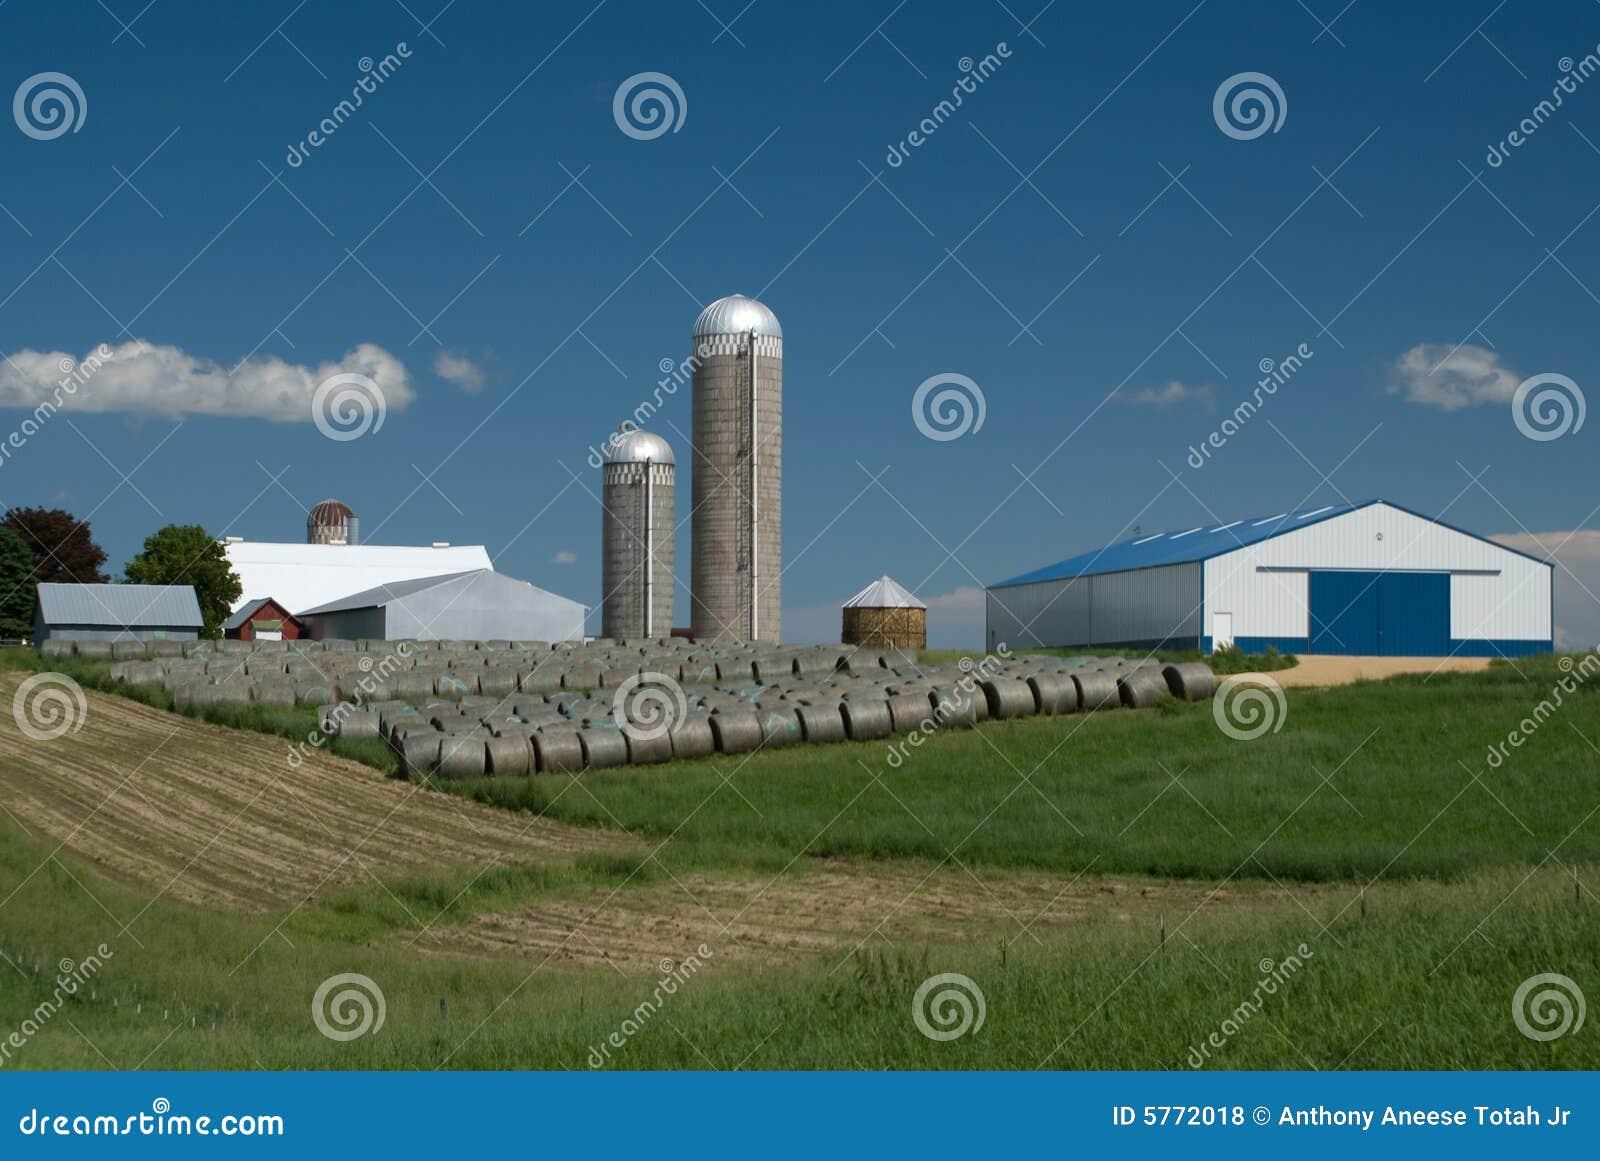 Launching a Custom-Hay Business